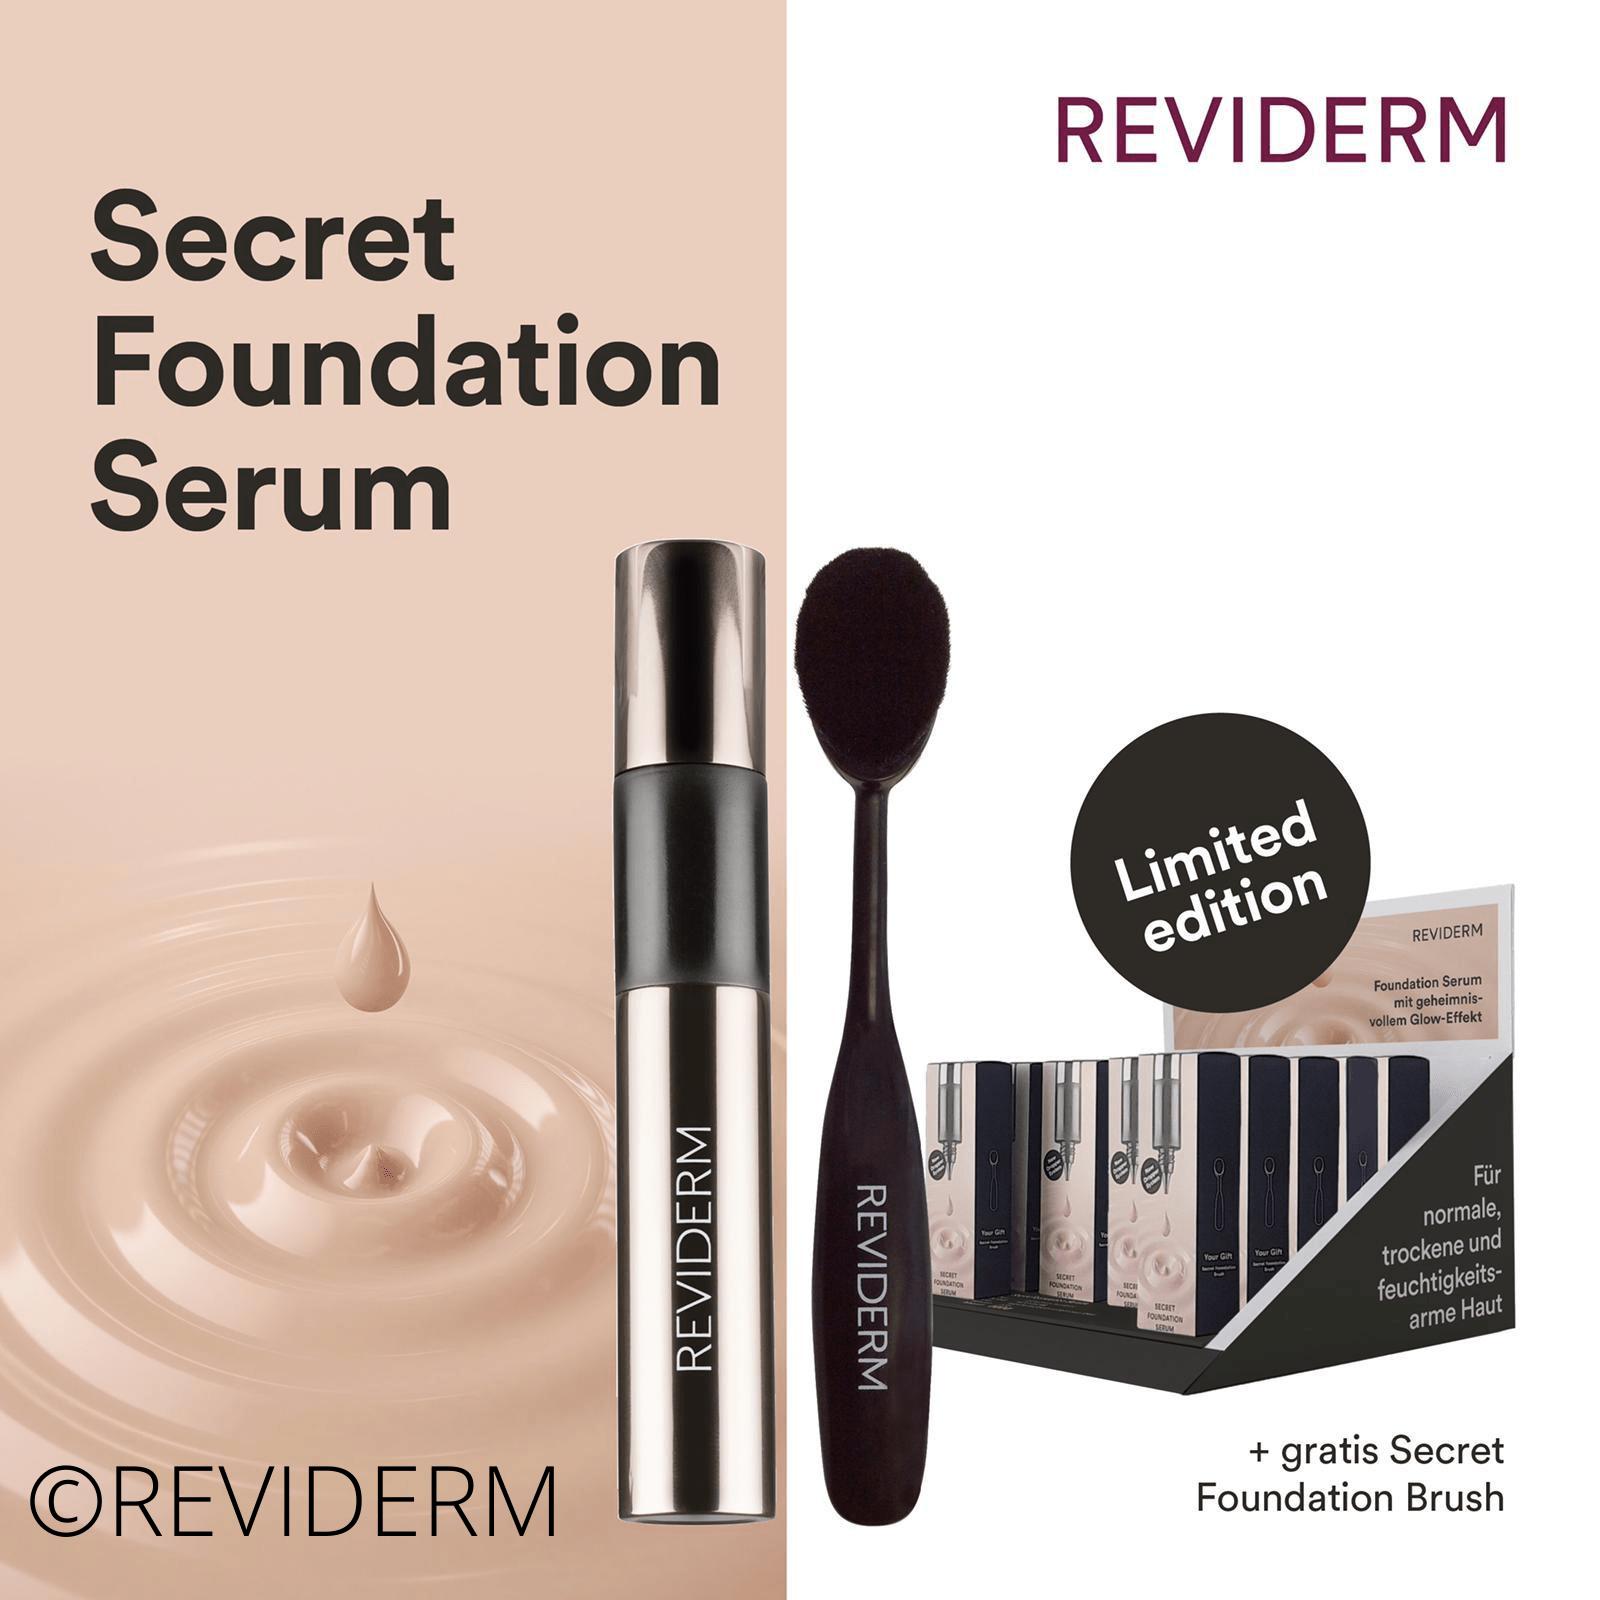 md-kosmetik-reviderm-serum